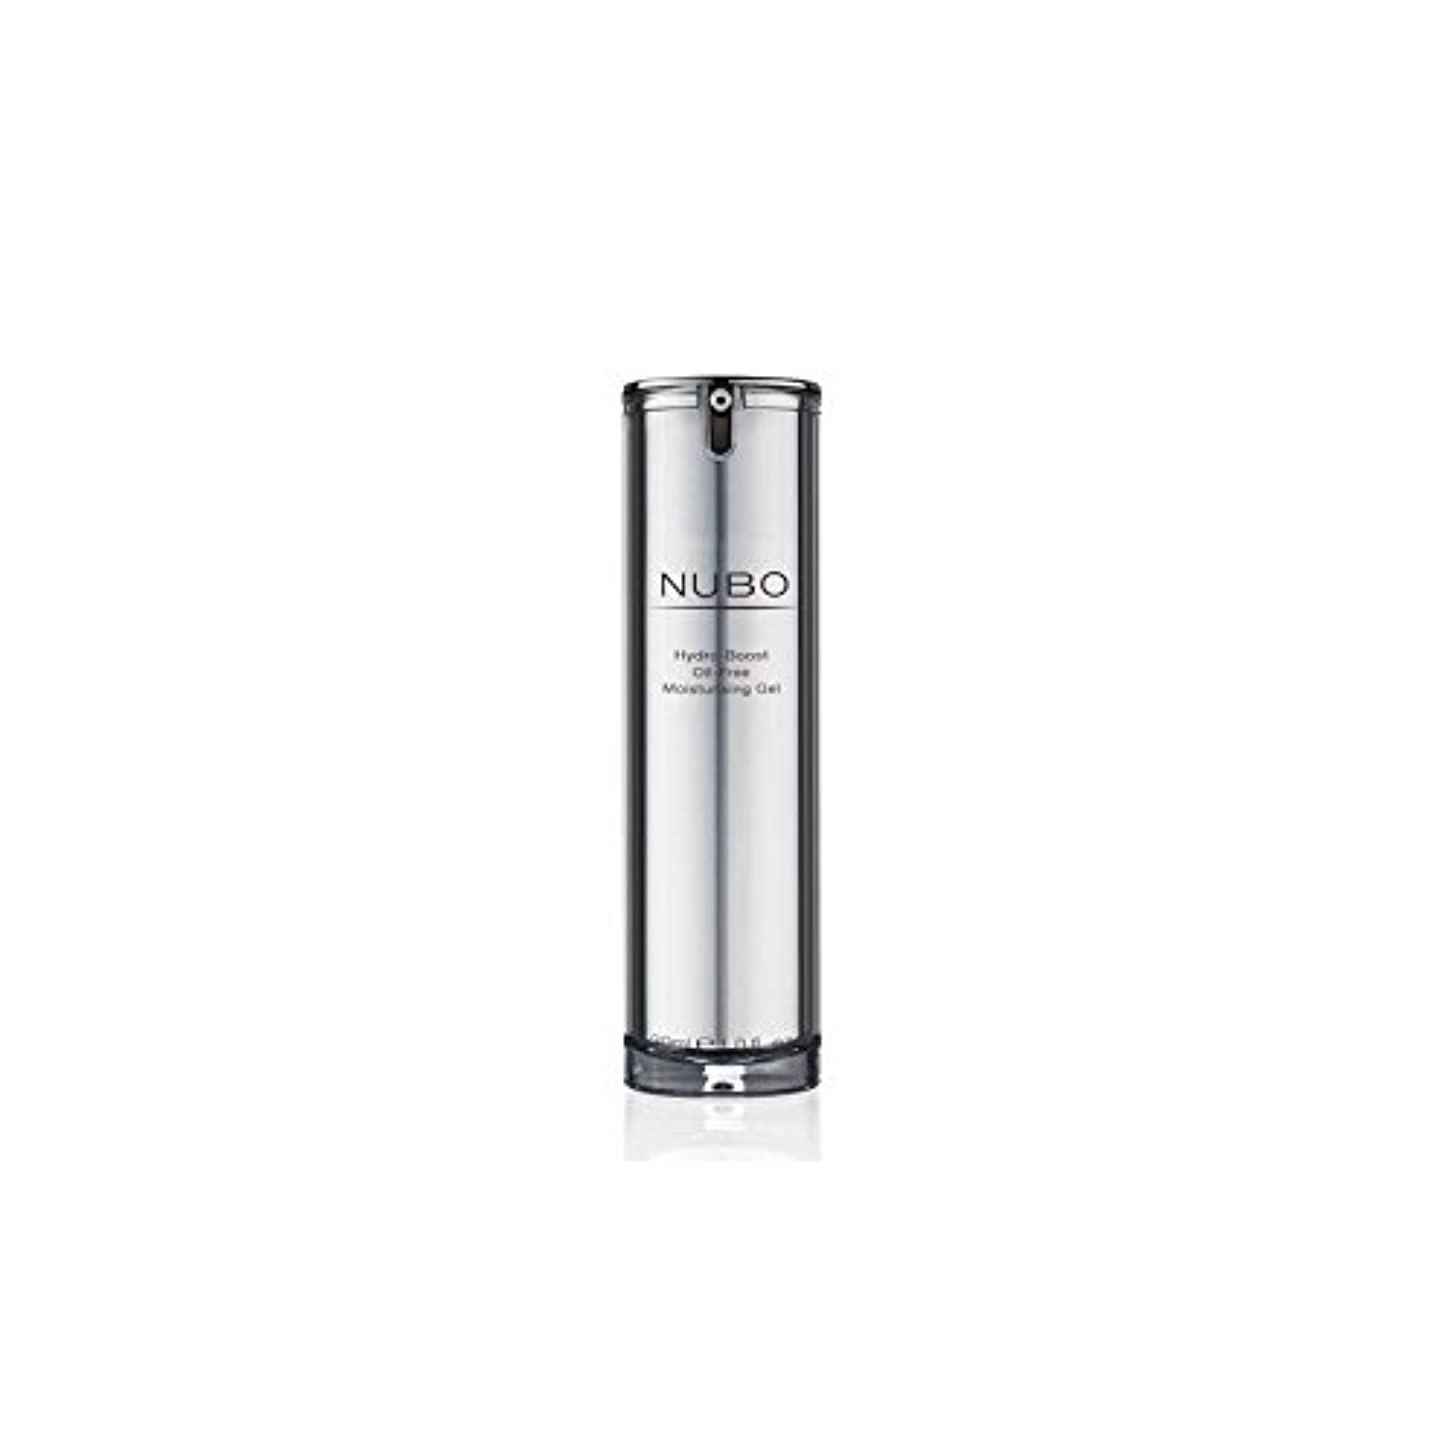 Nubo Hydro Boost Oil Free Moisturising Gel (30ml) (Pack of 6) - 水力ブーストオイルフリーの保湿ジェル(30ミリリットル) x6 [並行輸入品]